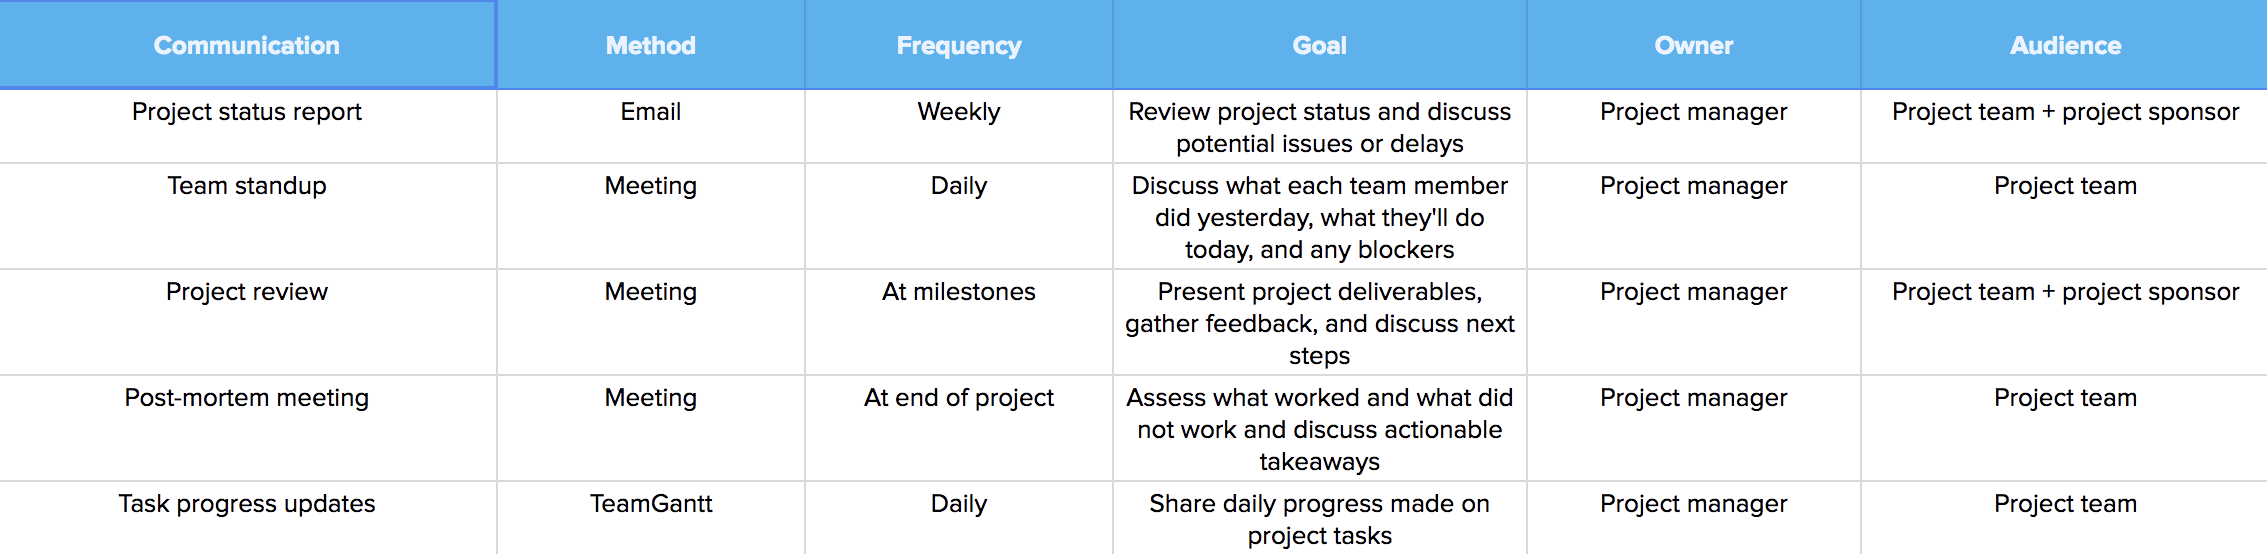 Simple matrix communication plan